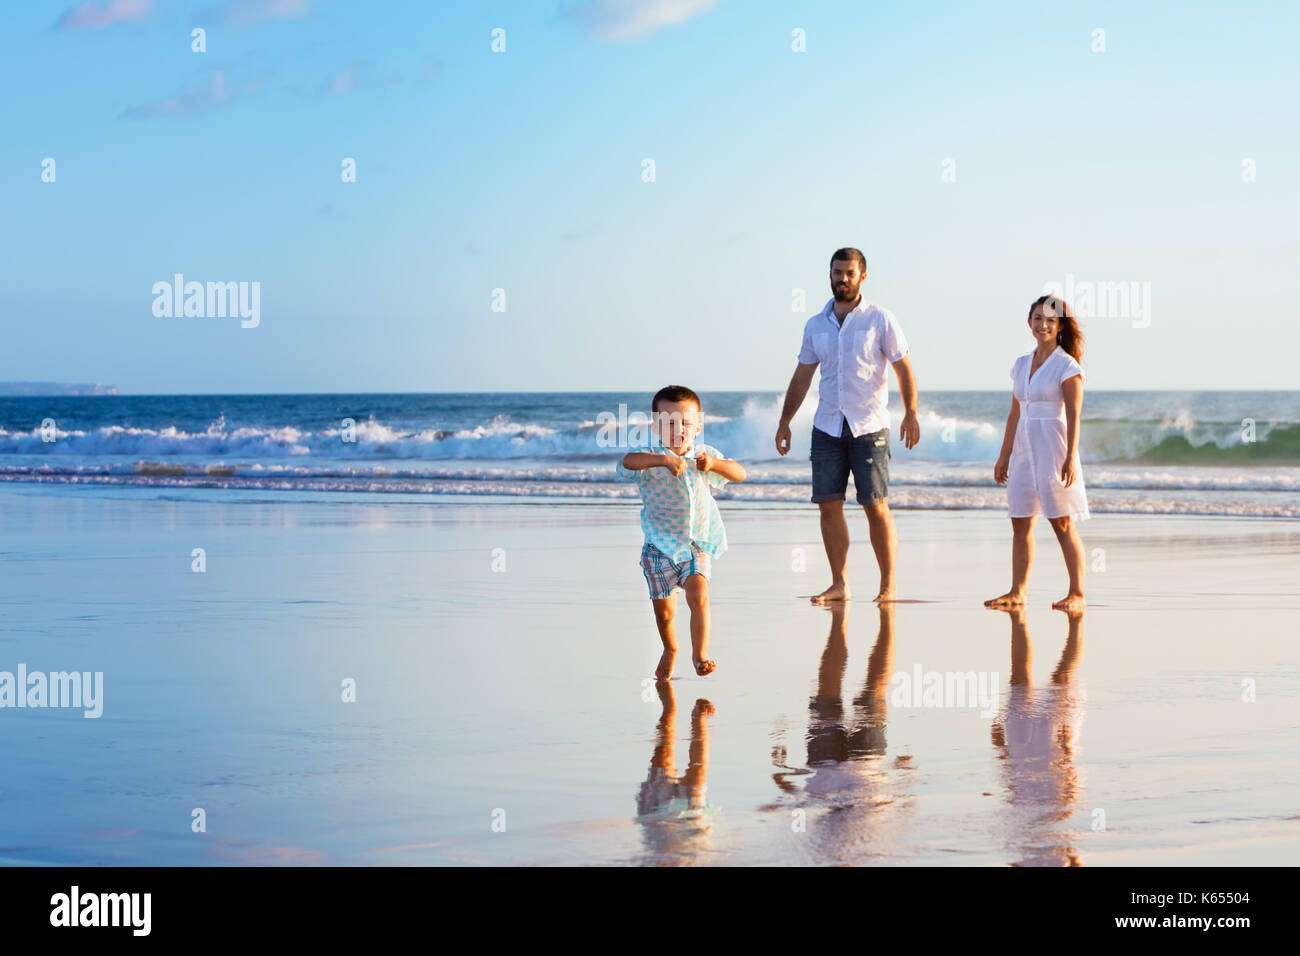 Familia feliz, padre, madre, hijo divertirse juntos, el niño ejecuta con toques de piscina de agua de mar a lo largo de sunset surf en la playa de arena negra. Viajes lif Imagen De Stock